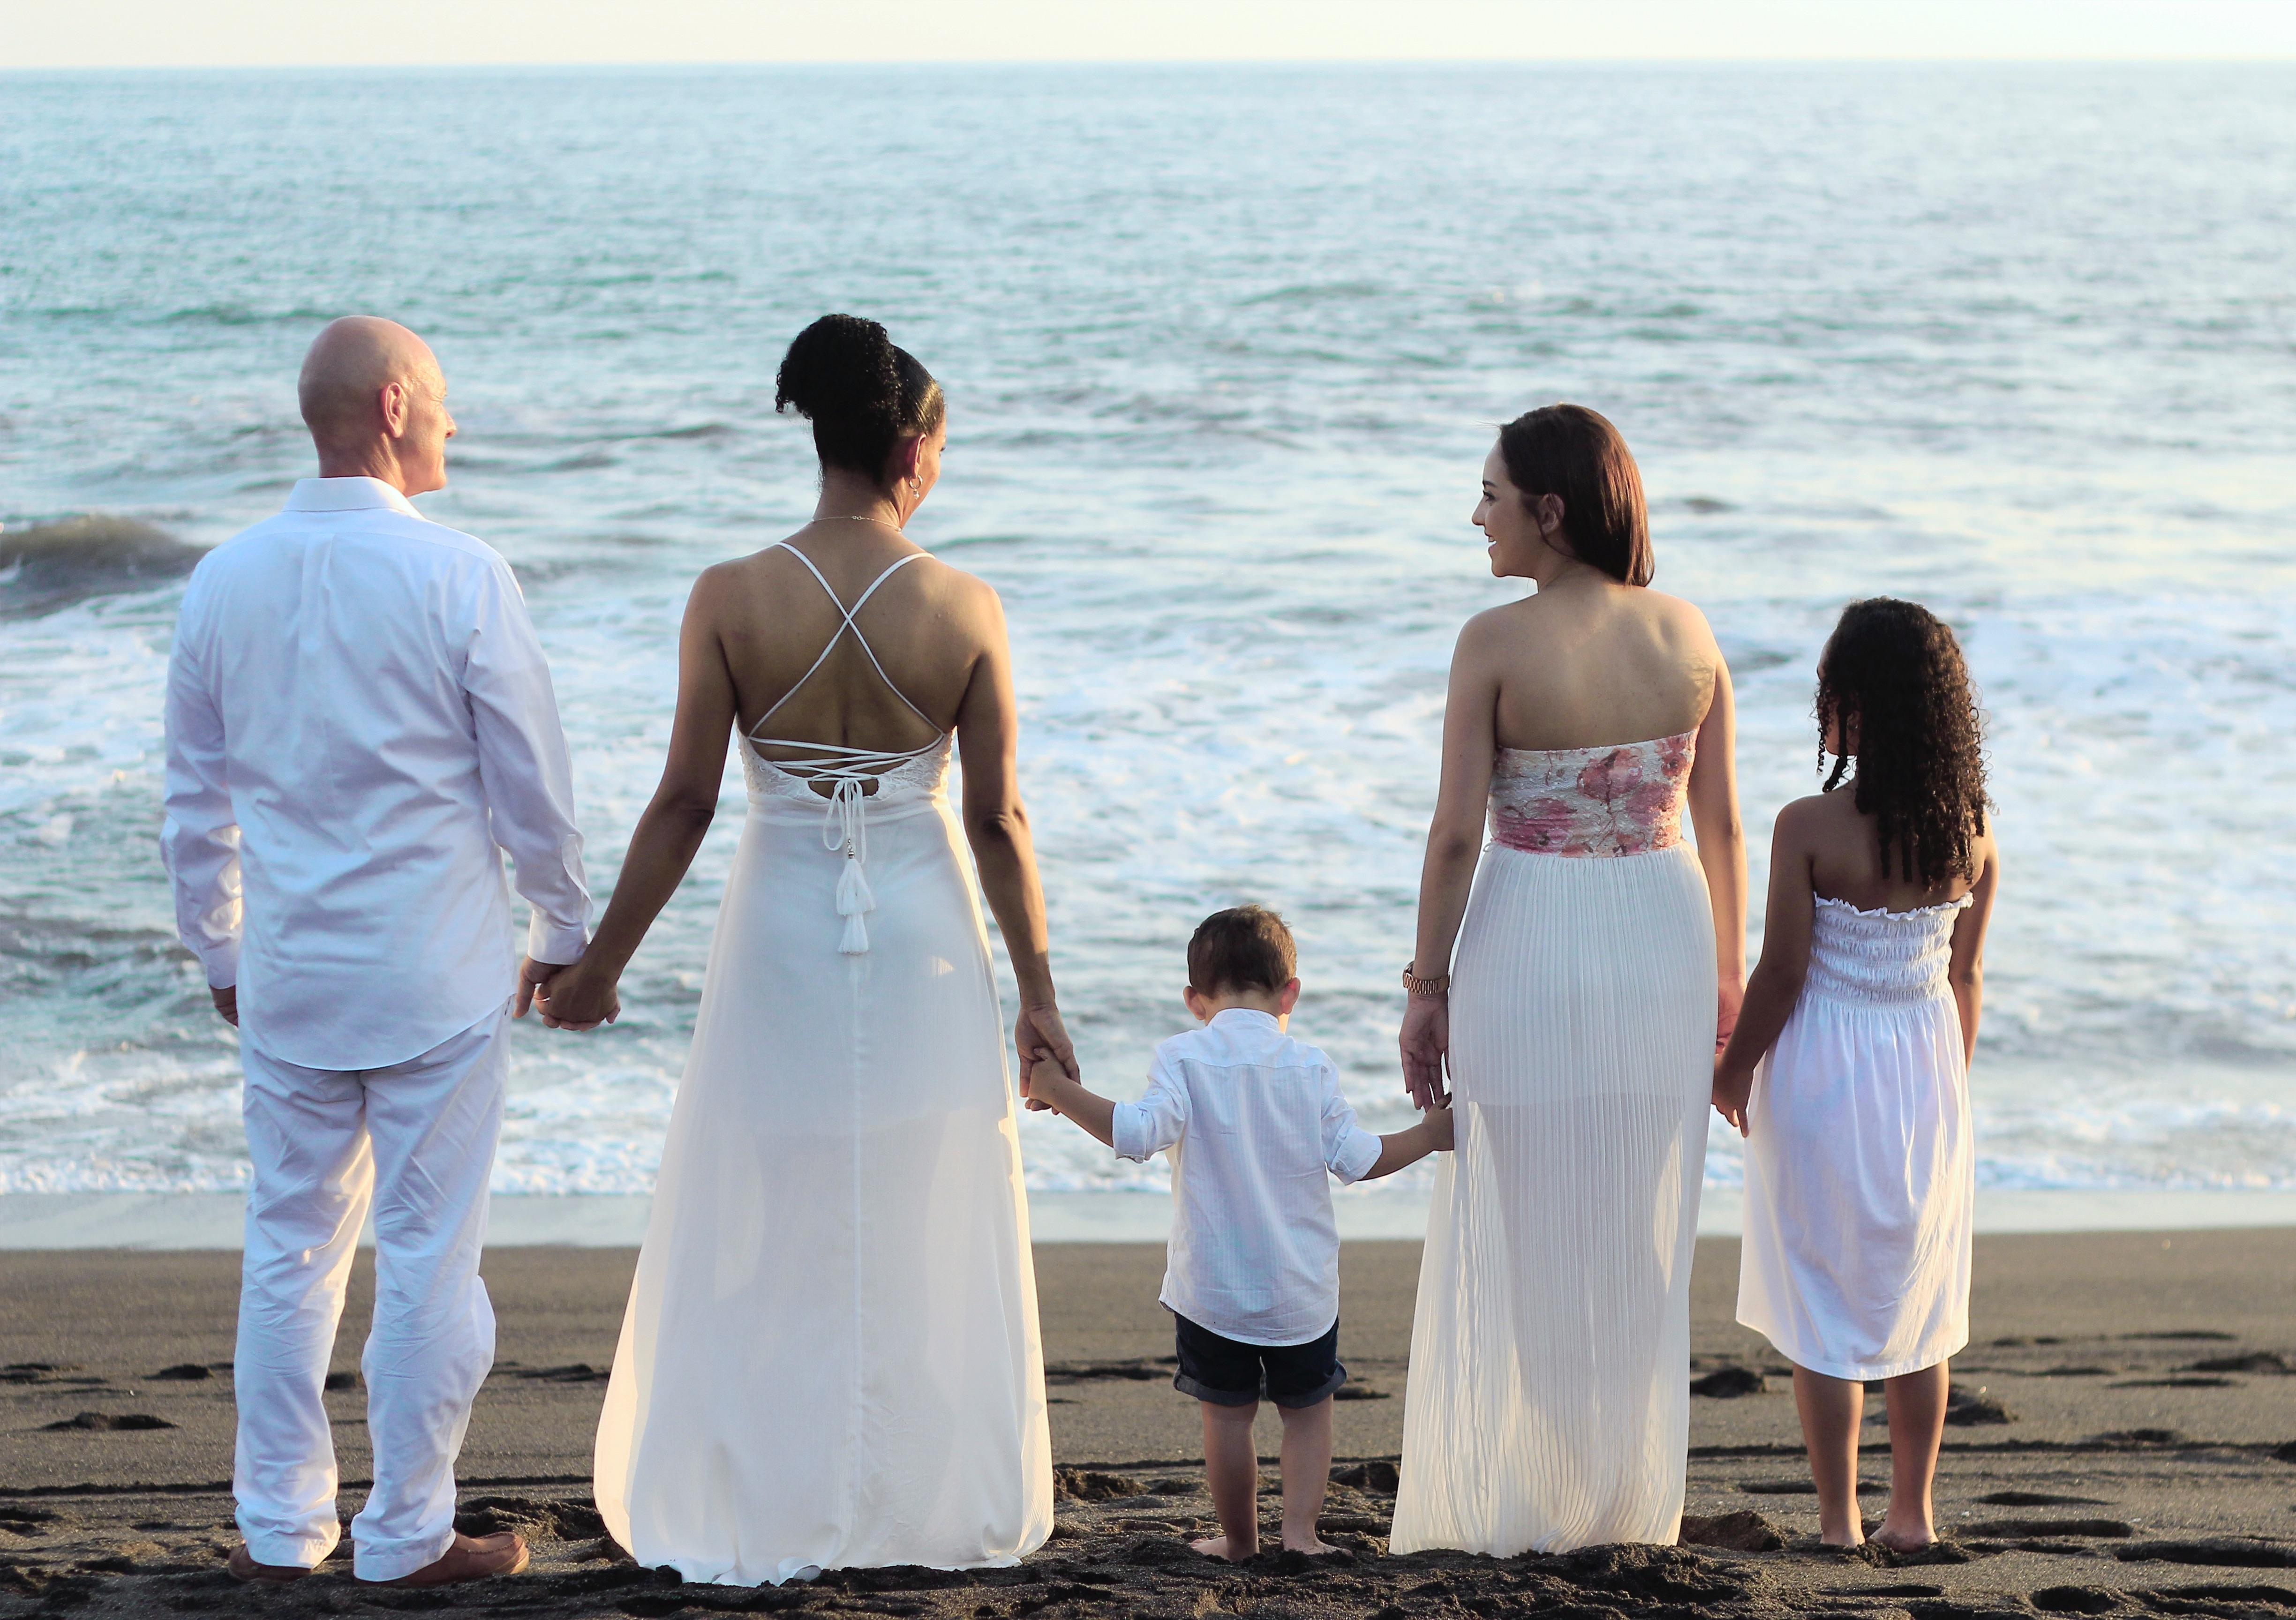 Free Images : man, woman, romance, wedding dress, bride, groom ...